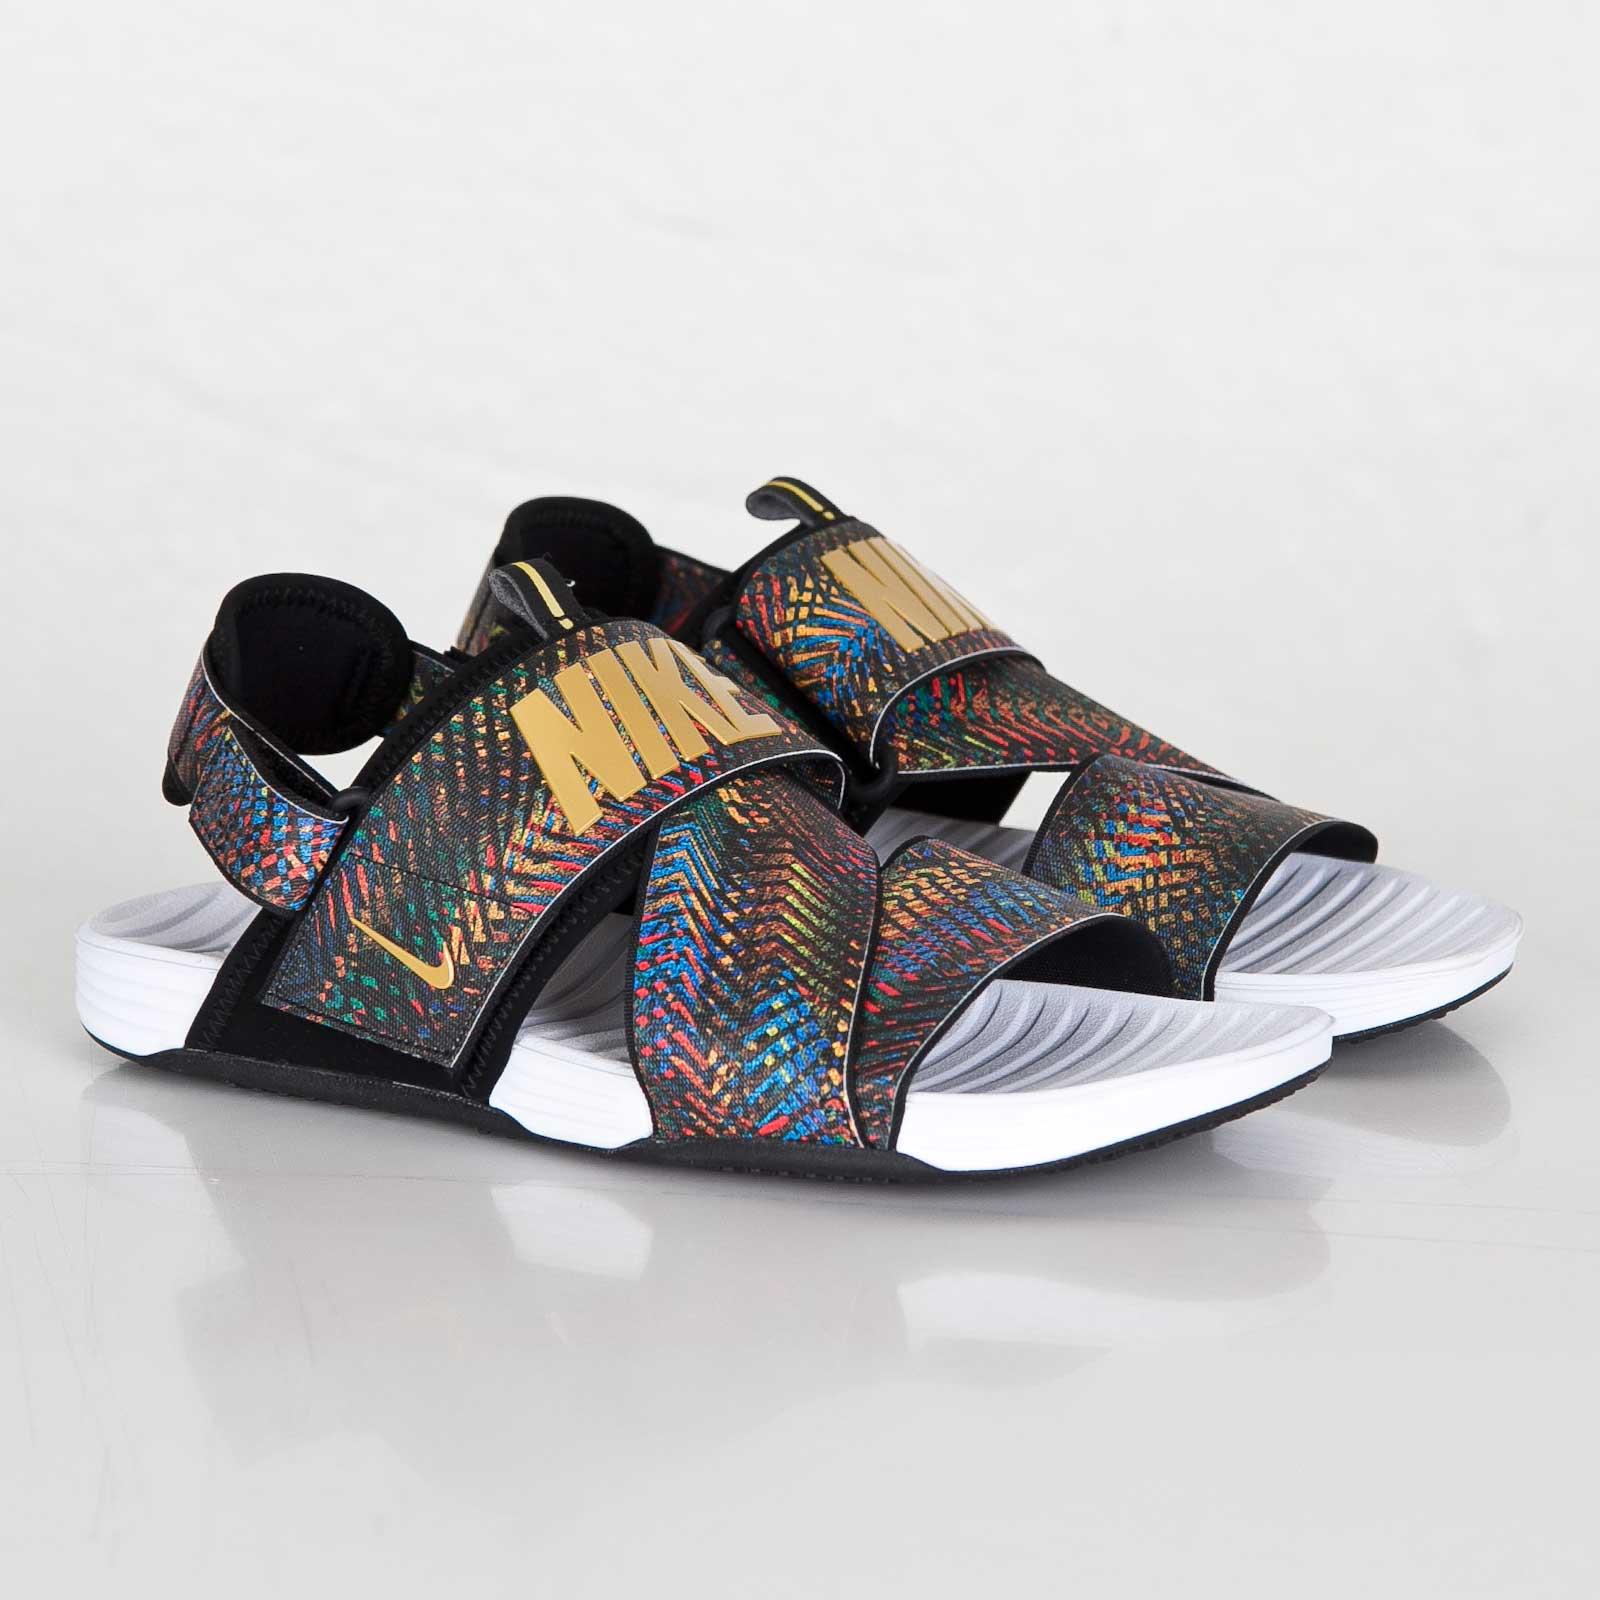 541600fa12ed Nike Air Solarsoft Zigzag QS - 705536-770 - Sneakersnstuff ...